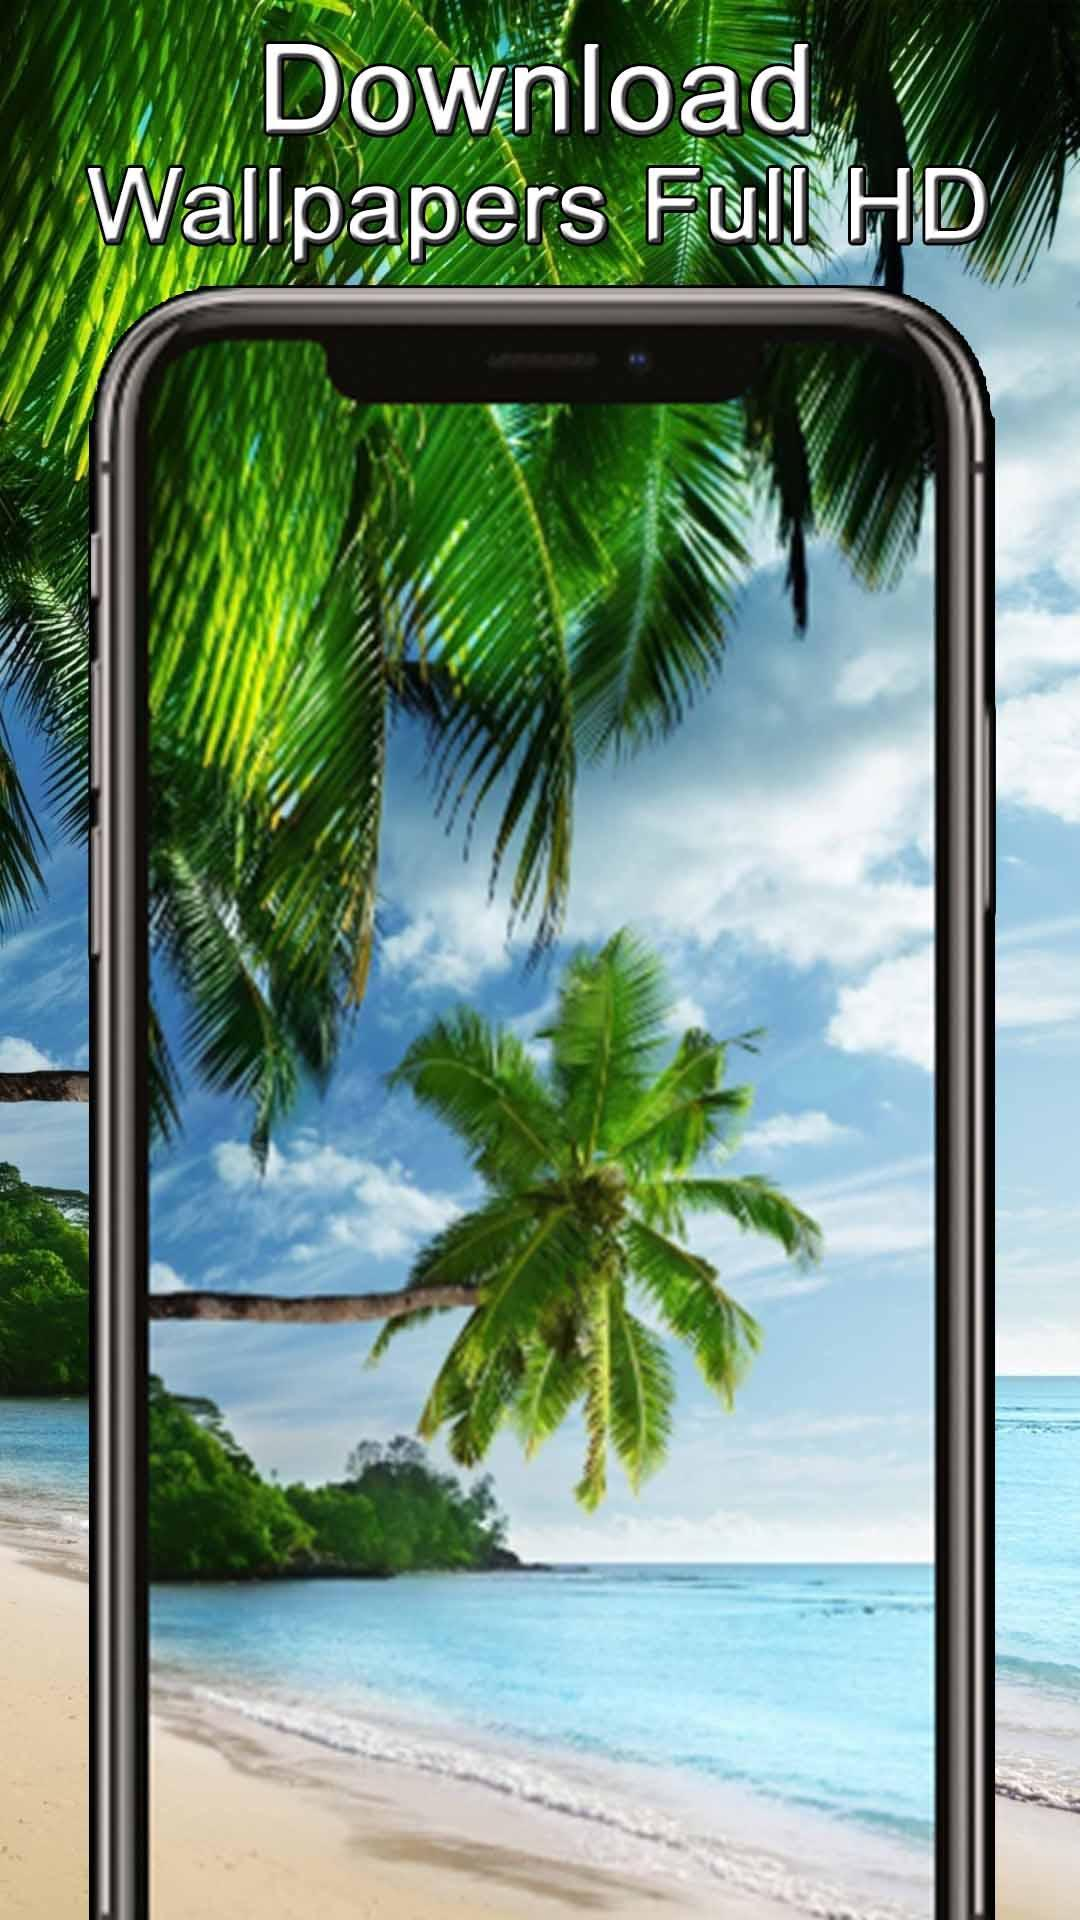 Beach Wallpapers Full Hd для андроид скачать Apk